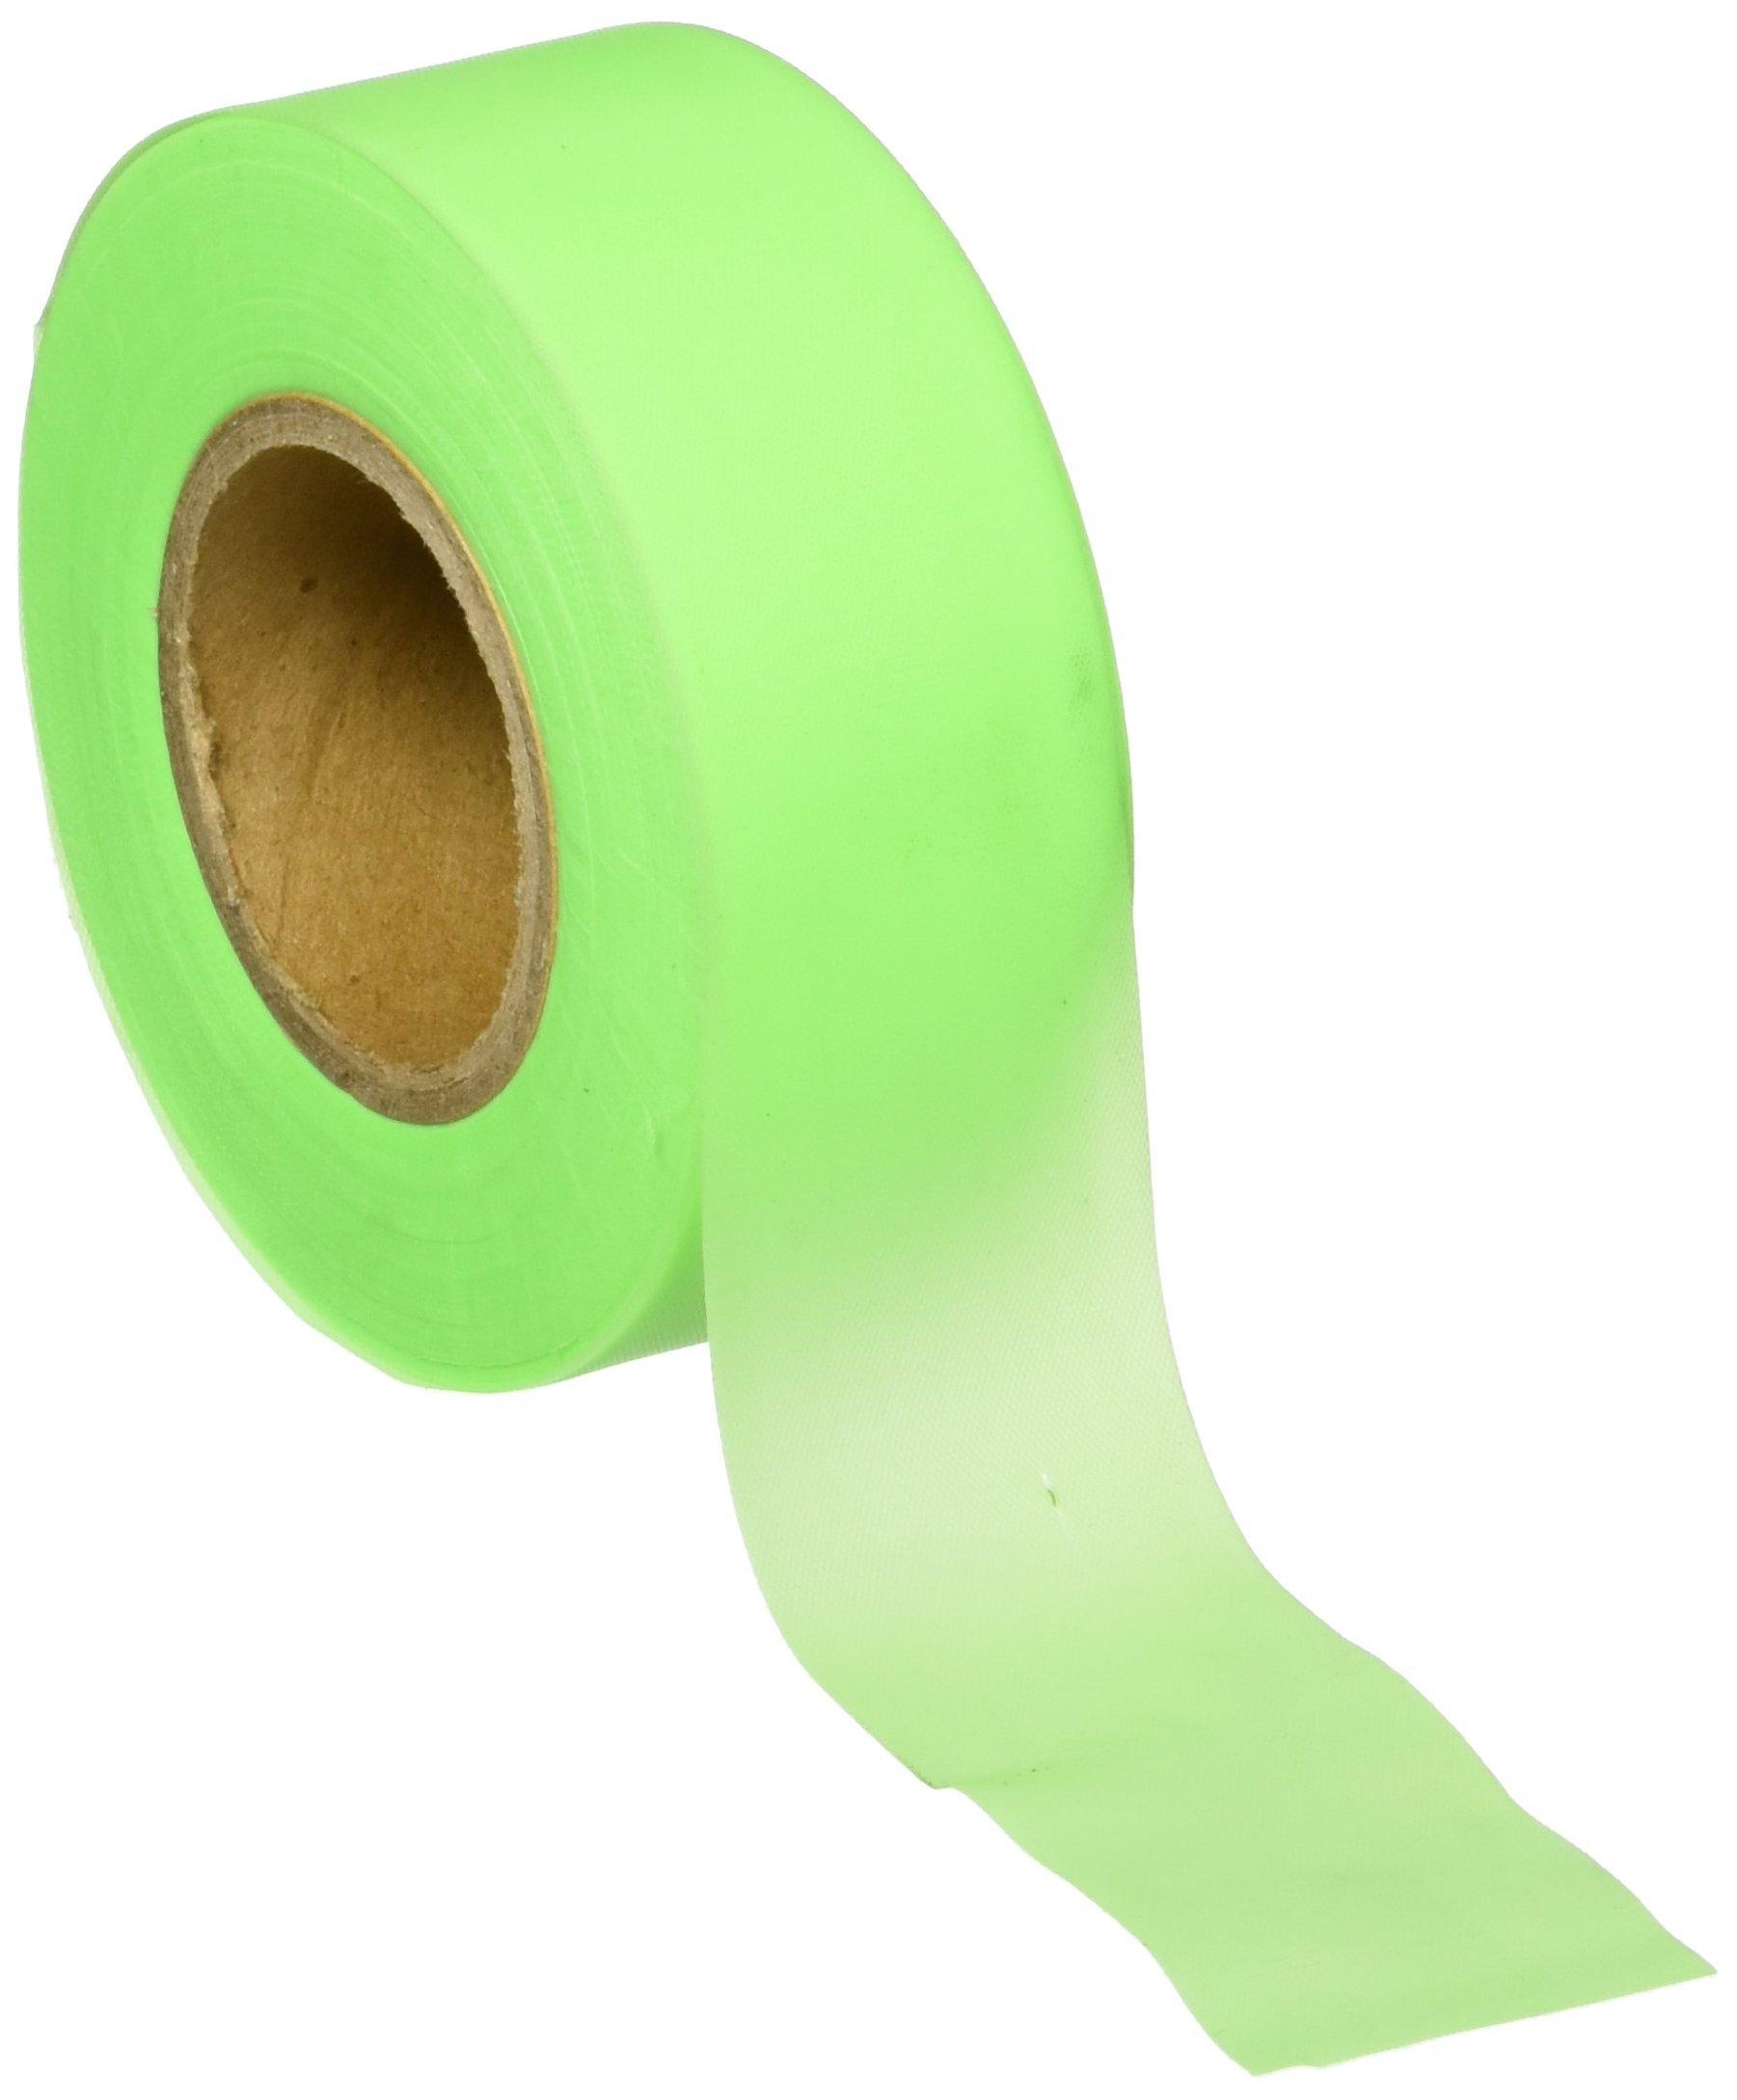 Hanson C H 17001 150' Glow Flag Tape